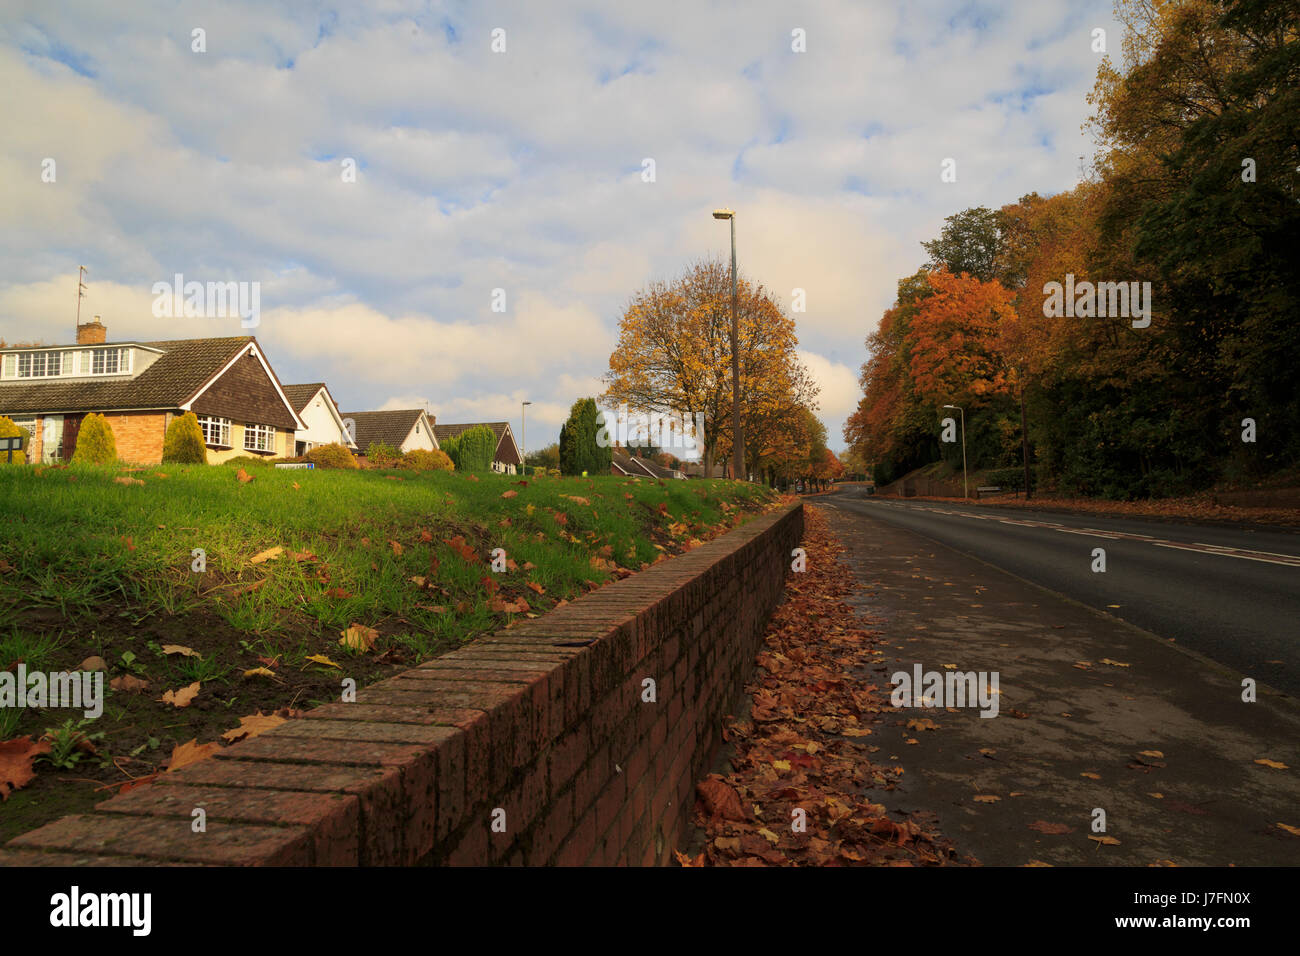 Stourbridge - Stock Image